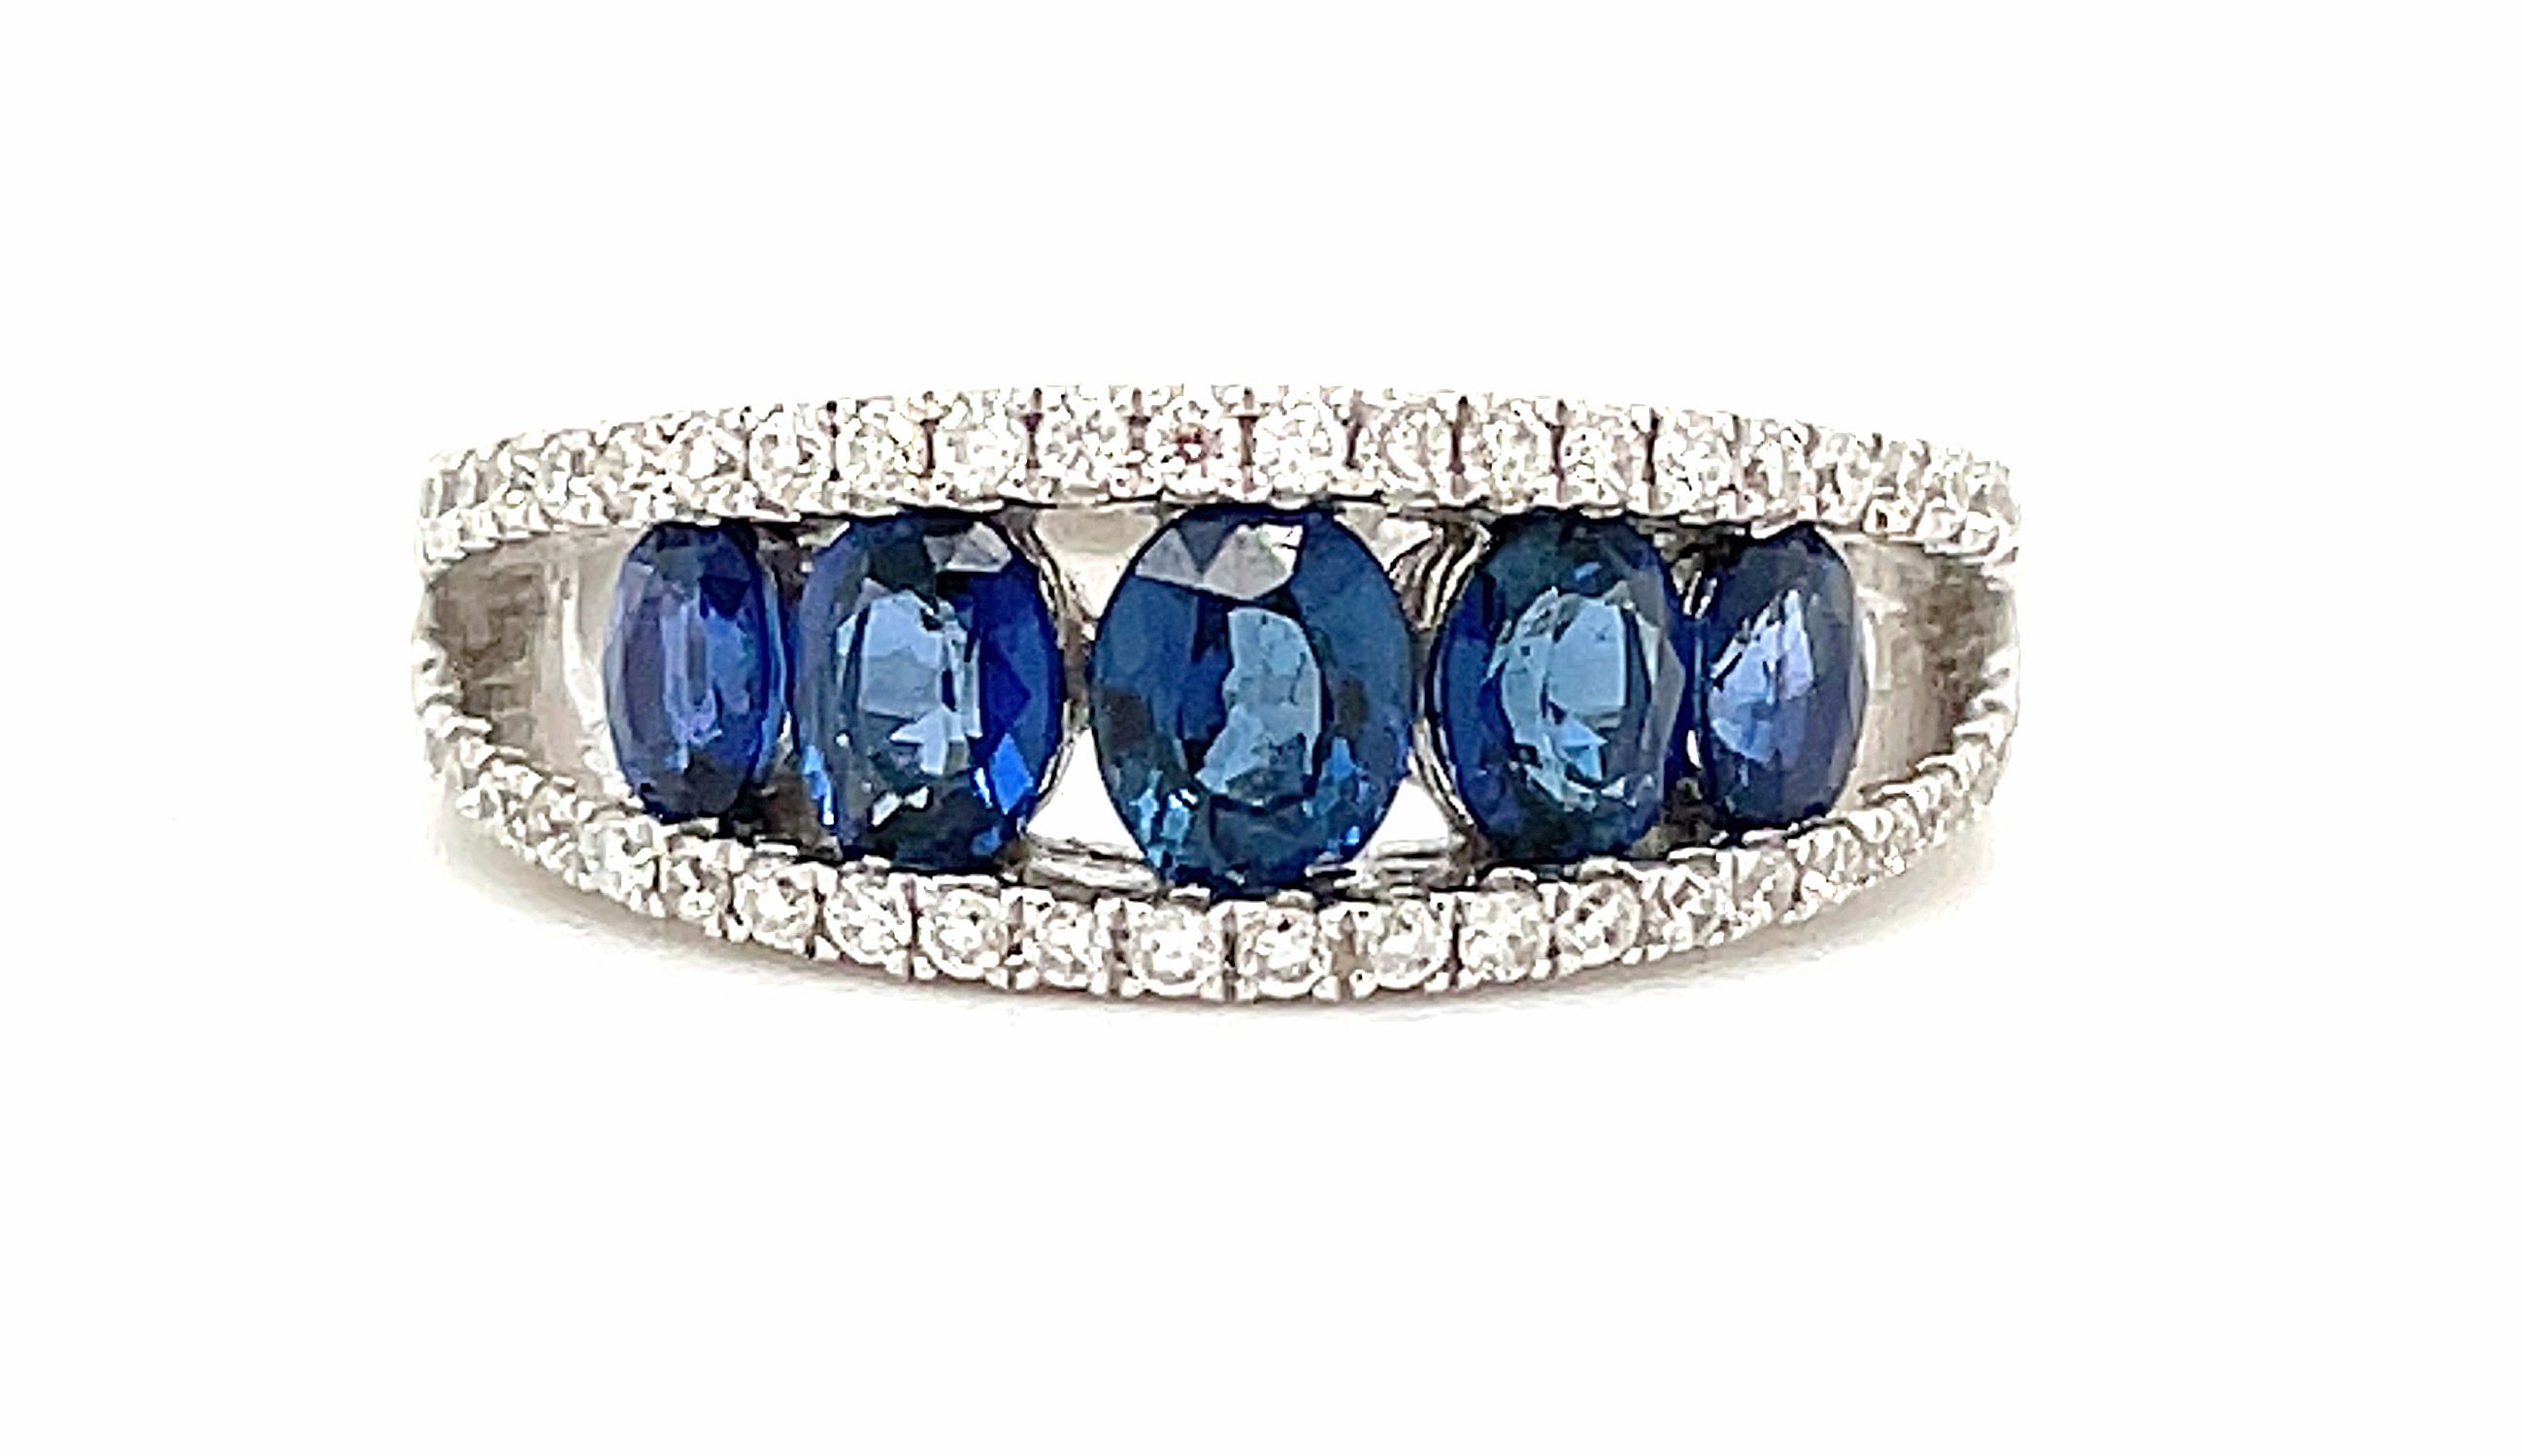 18k White Gold Oval Sapphire & Brilliant Cut Diamond Dress Ring